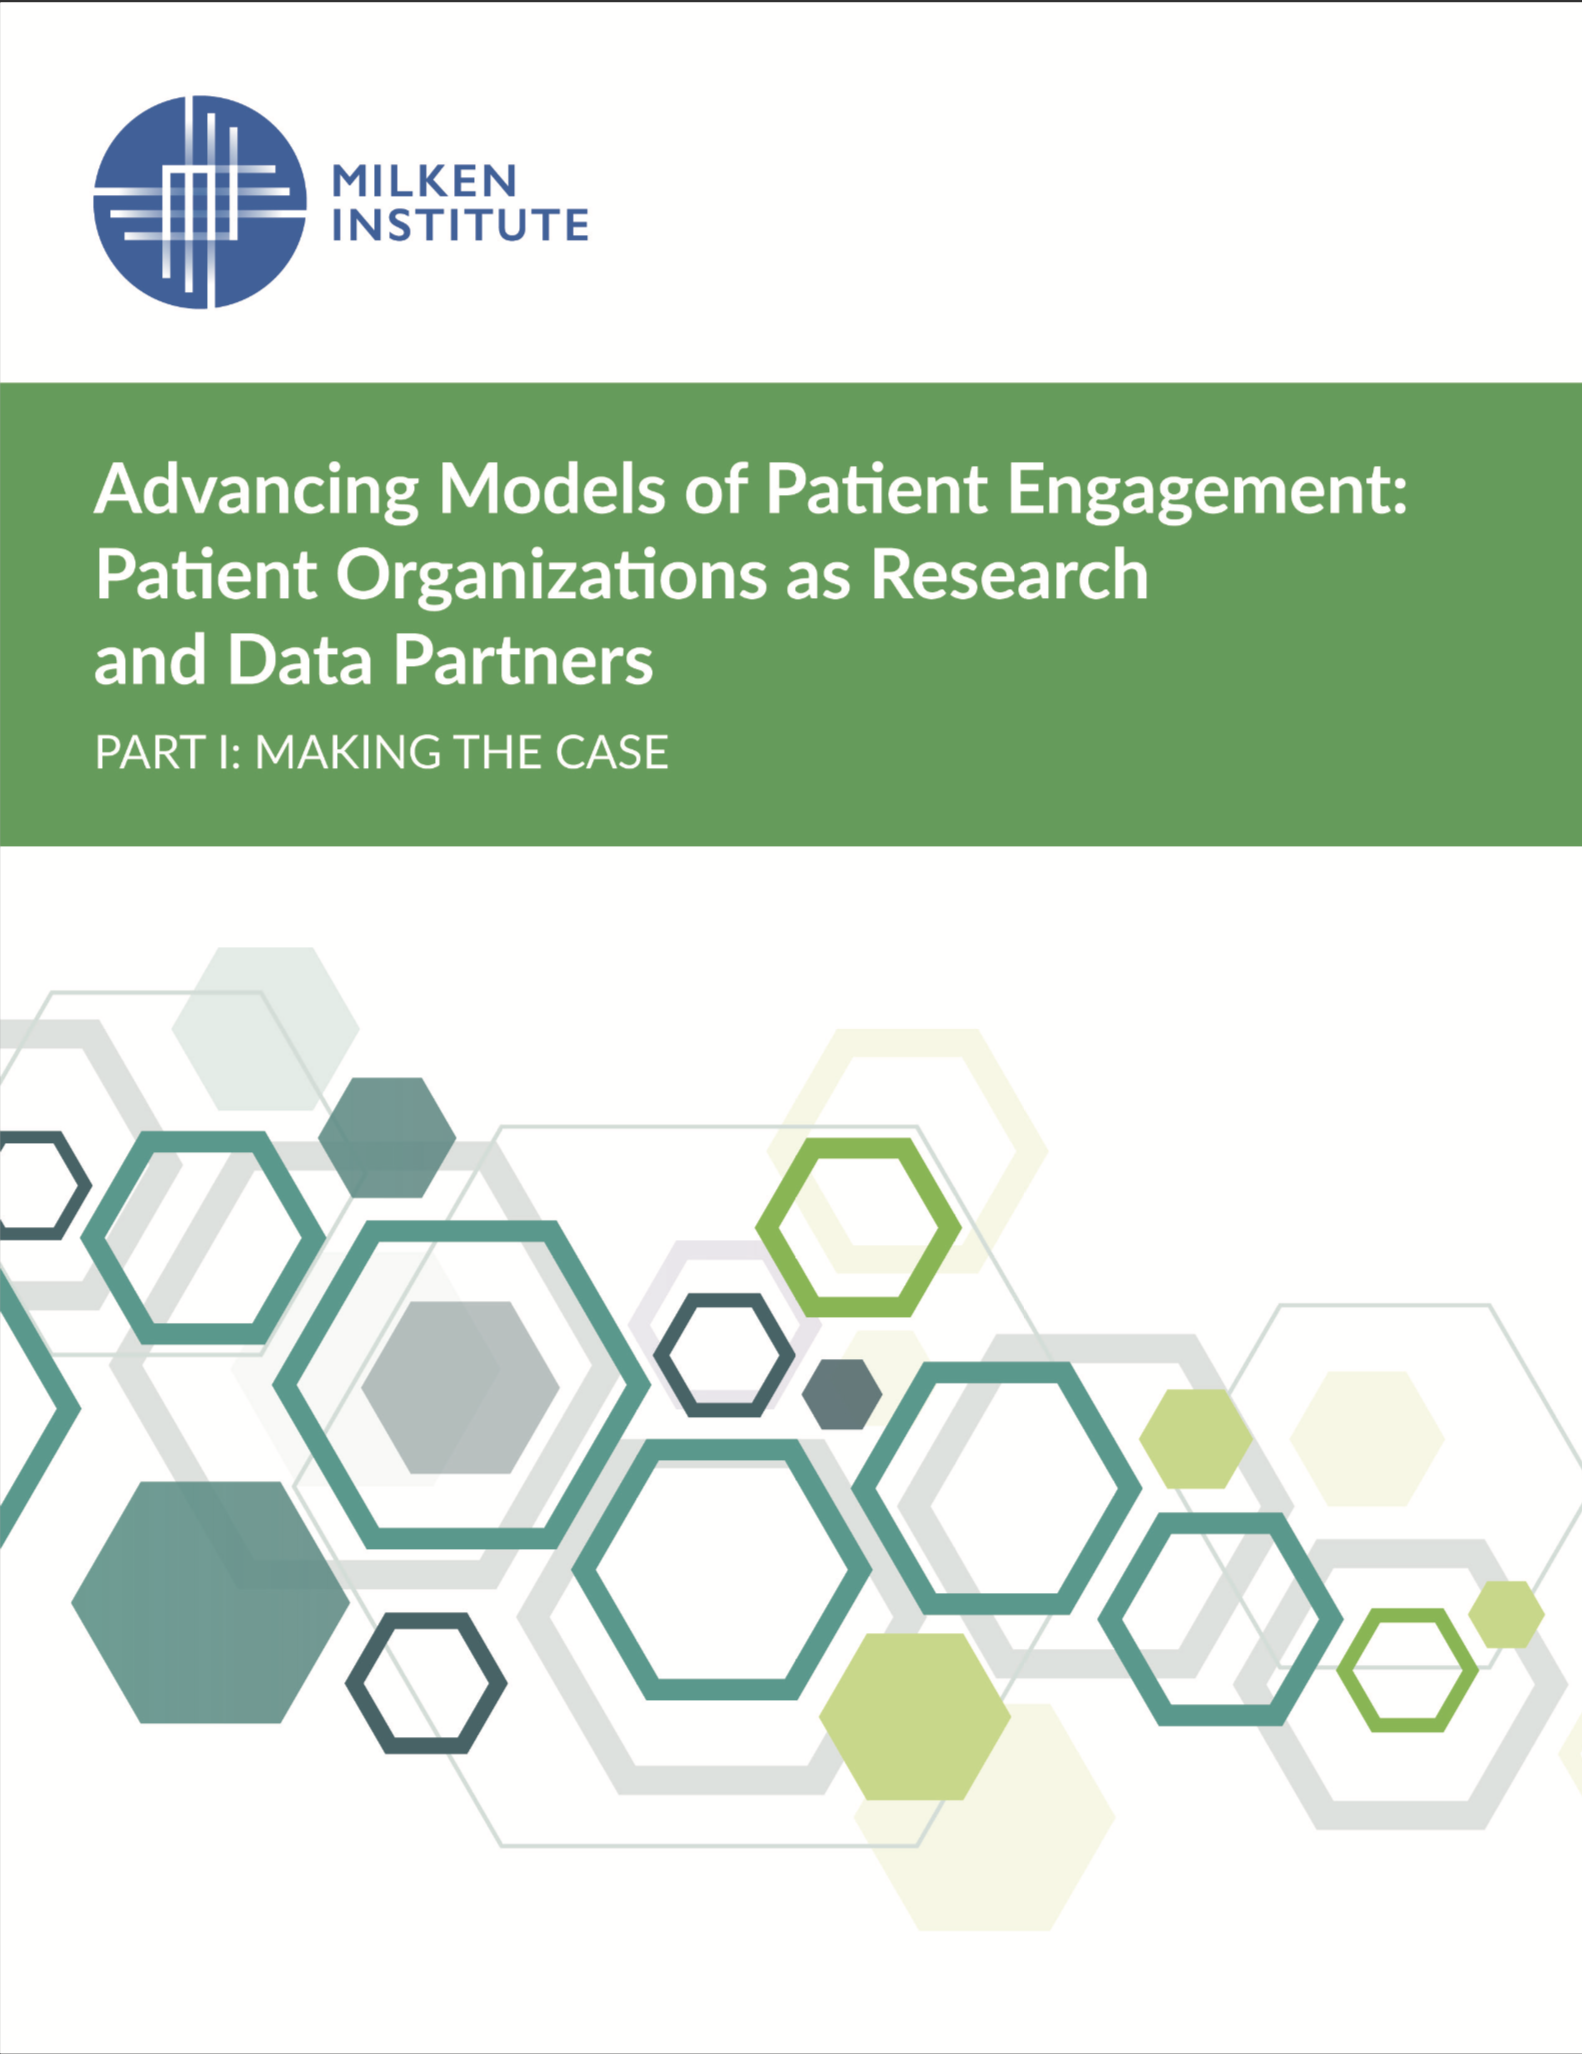 Advancing Models of Patient Engagement